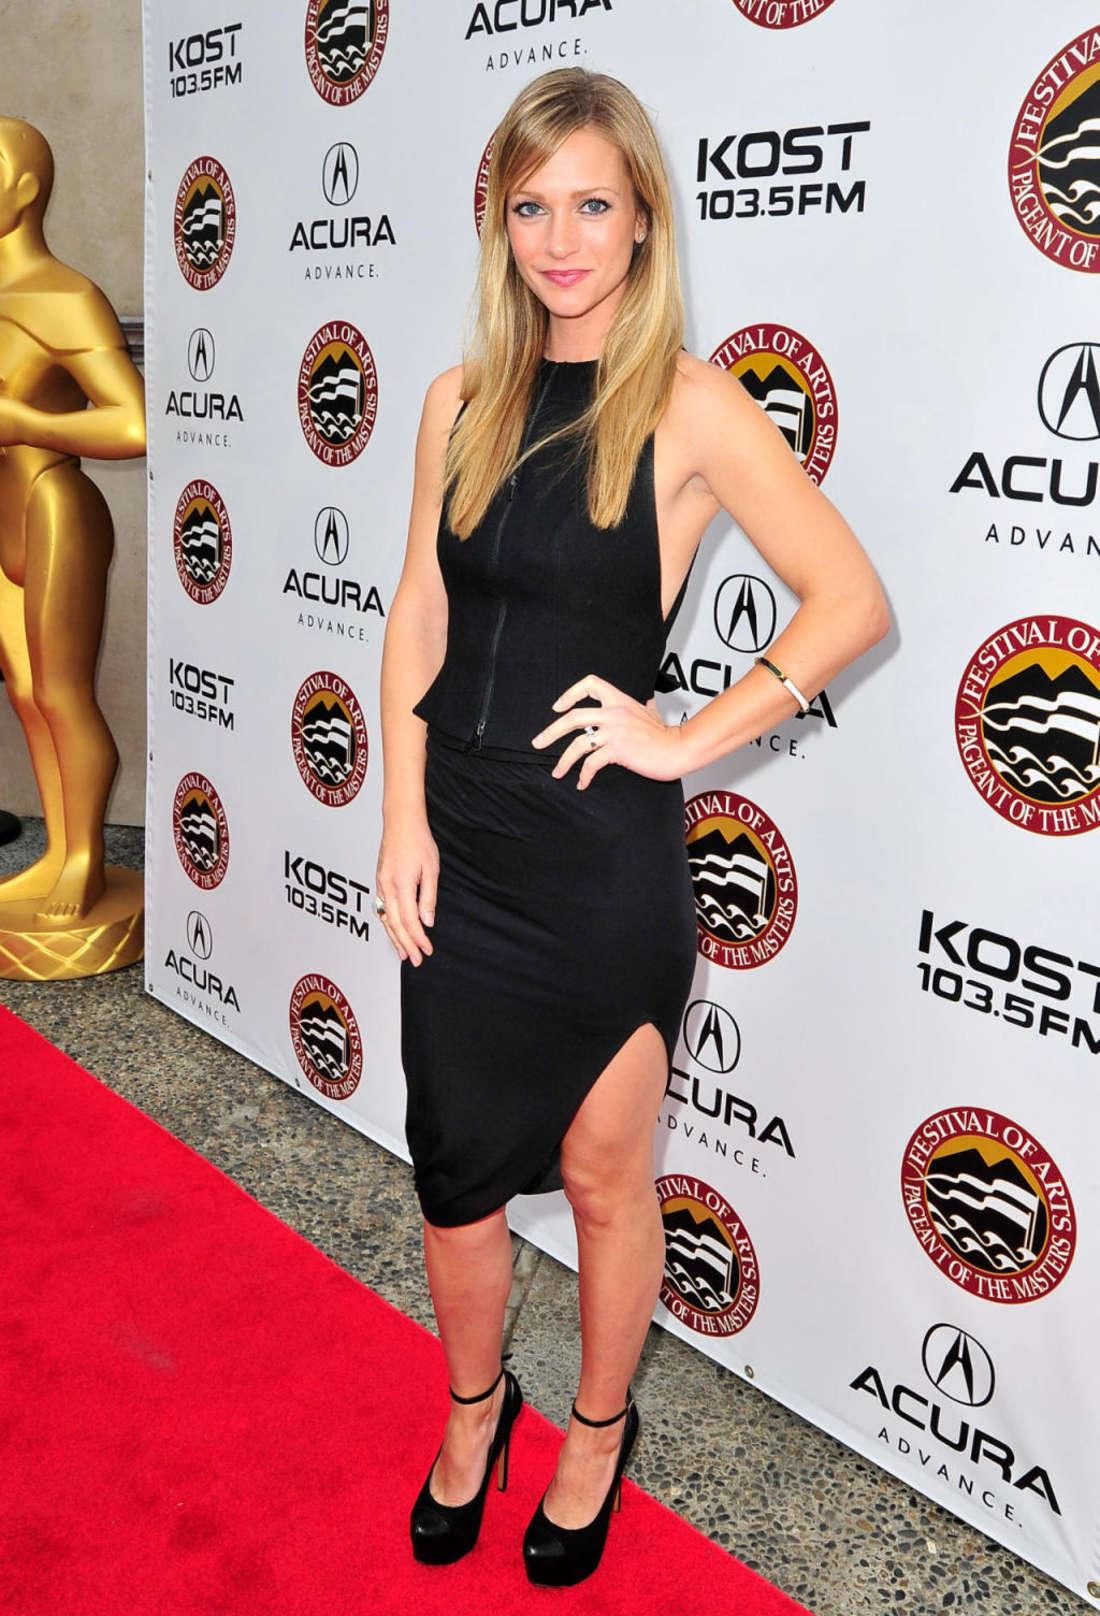 AJ Cook Acura KOST Celebrity Benefit Concert in Laguna Beach